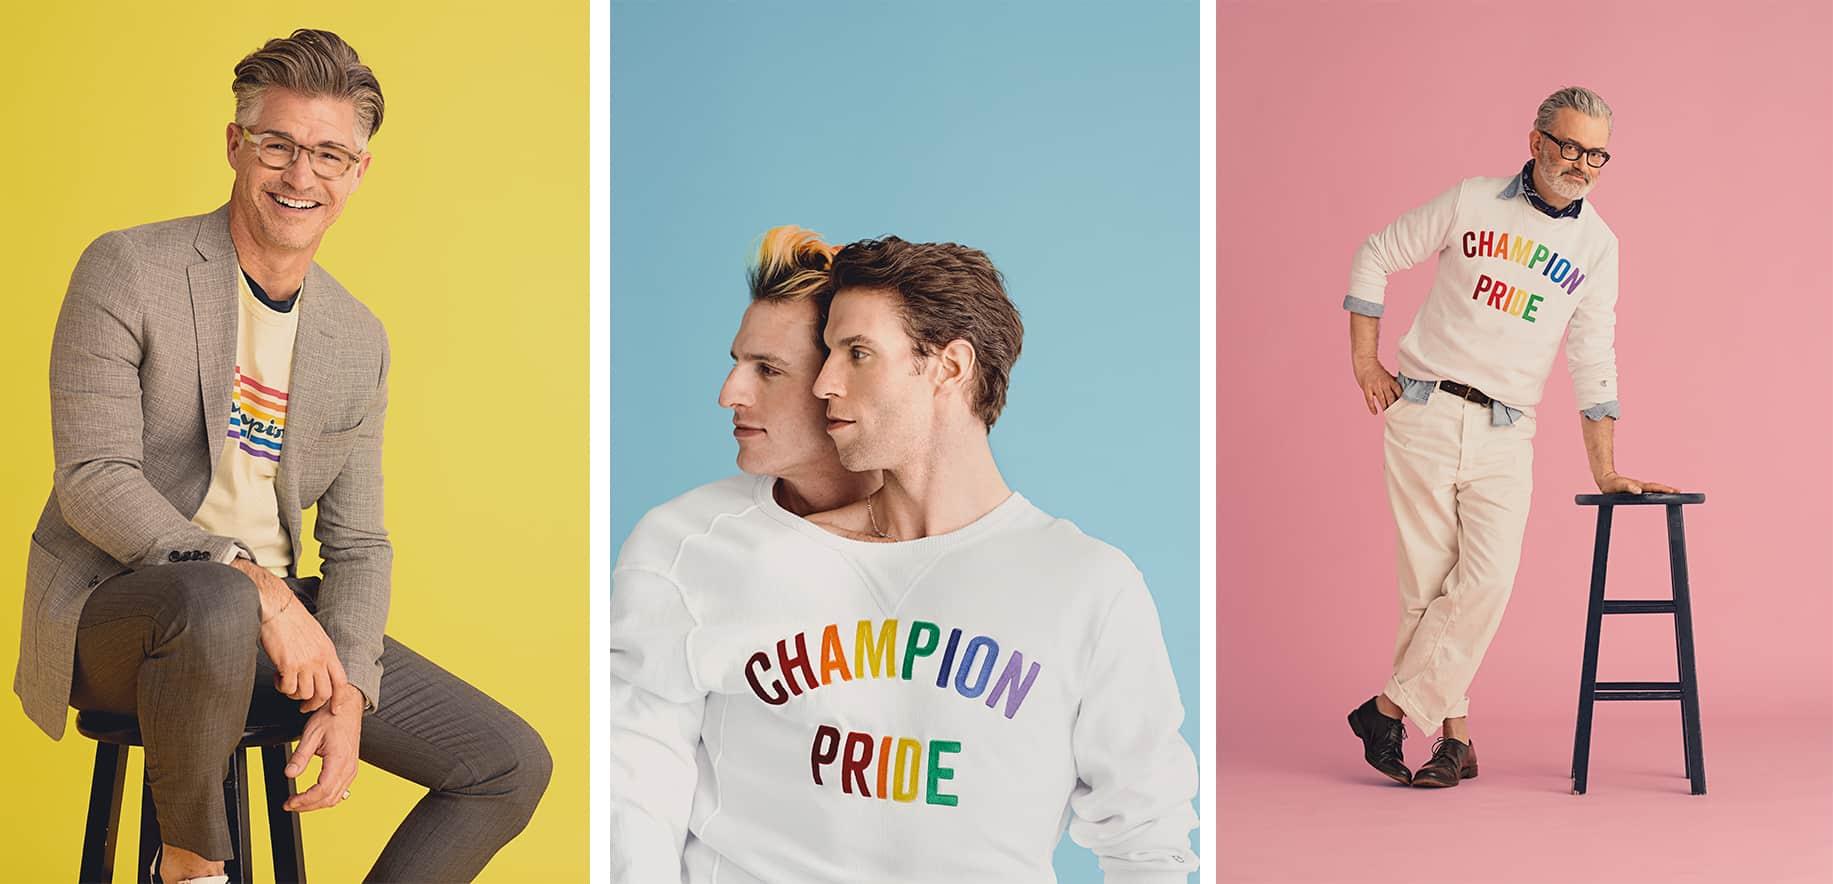 Todd Snyder x Champion Pride